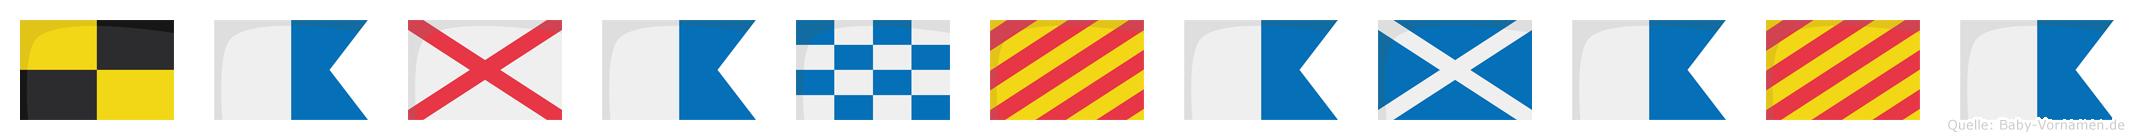 Lavanyamaya im Flaggenalphabet